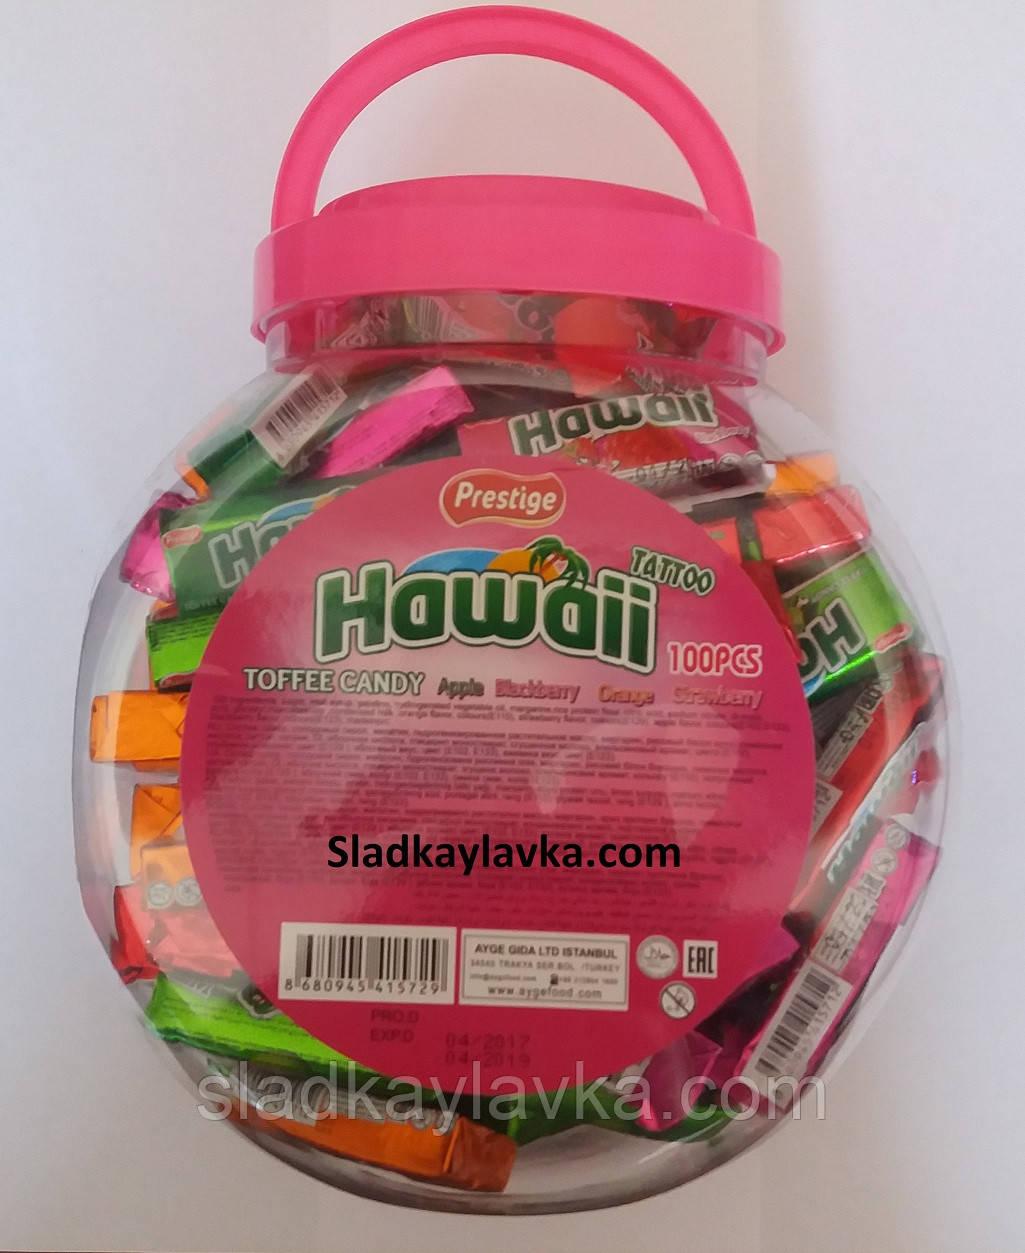 Жевательная конфета Hawaii Toffee Candy Tattoo 100 шт (Prestige)